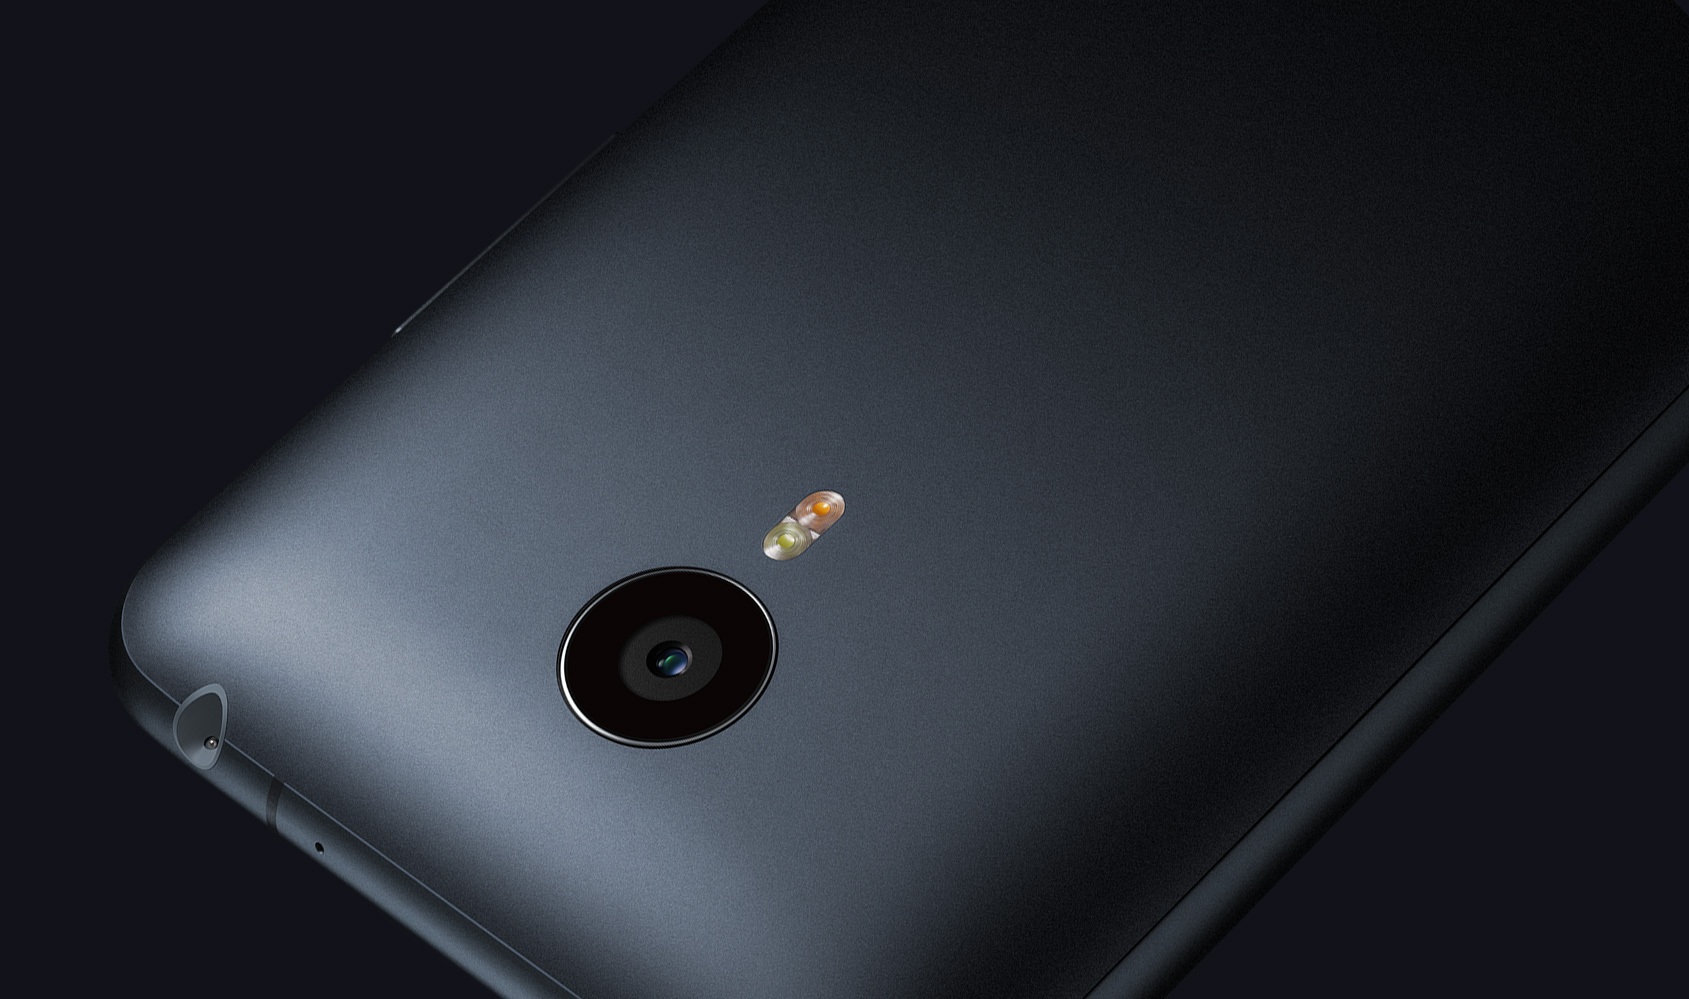 design-camera-1